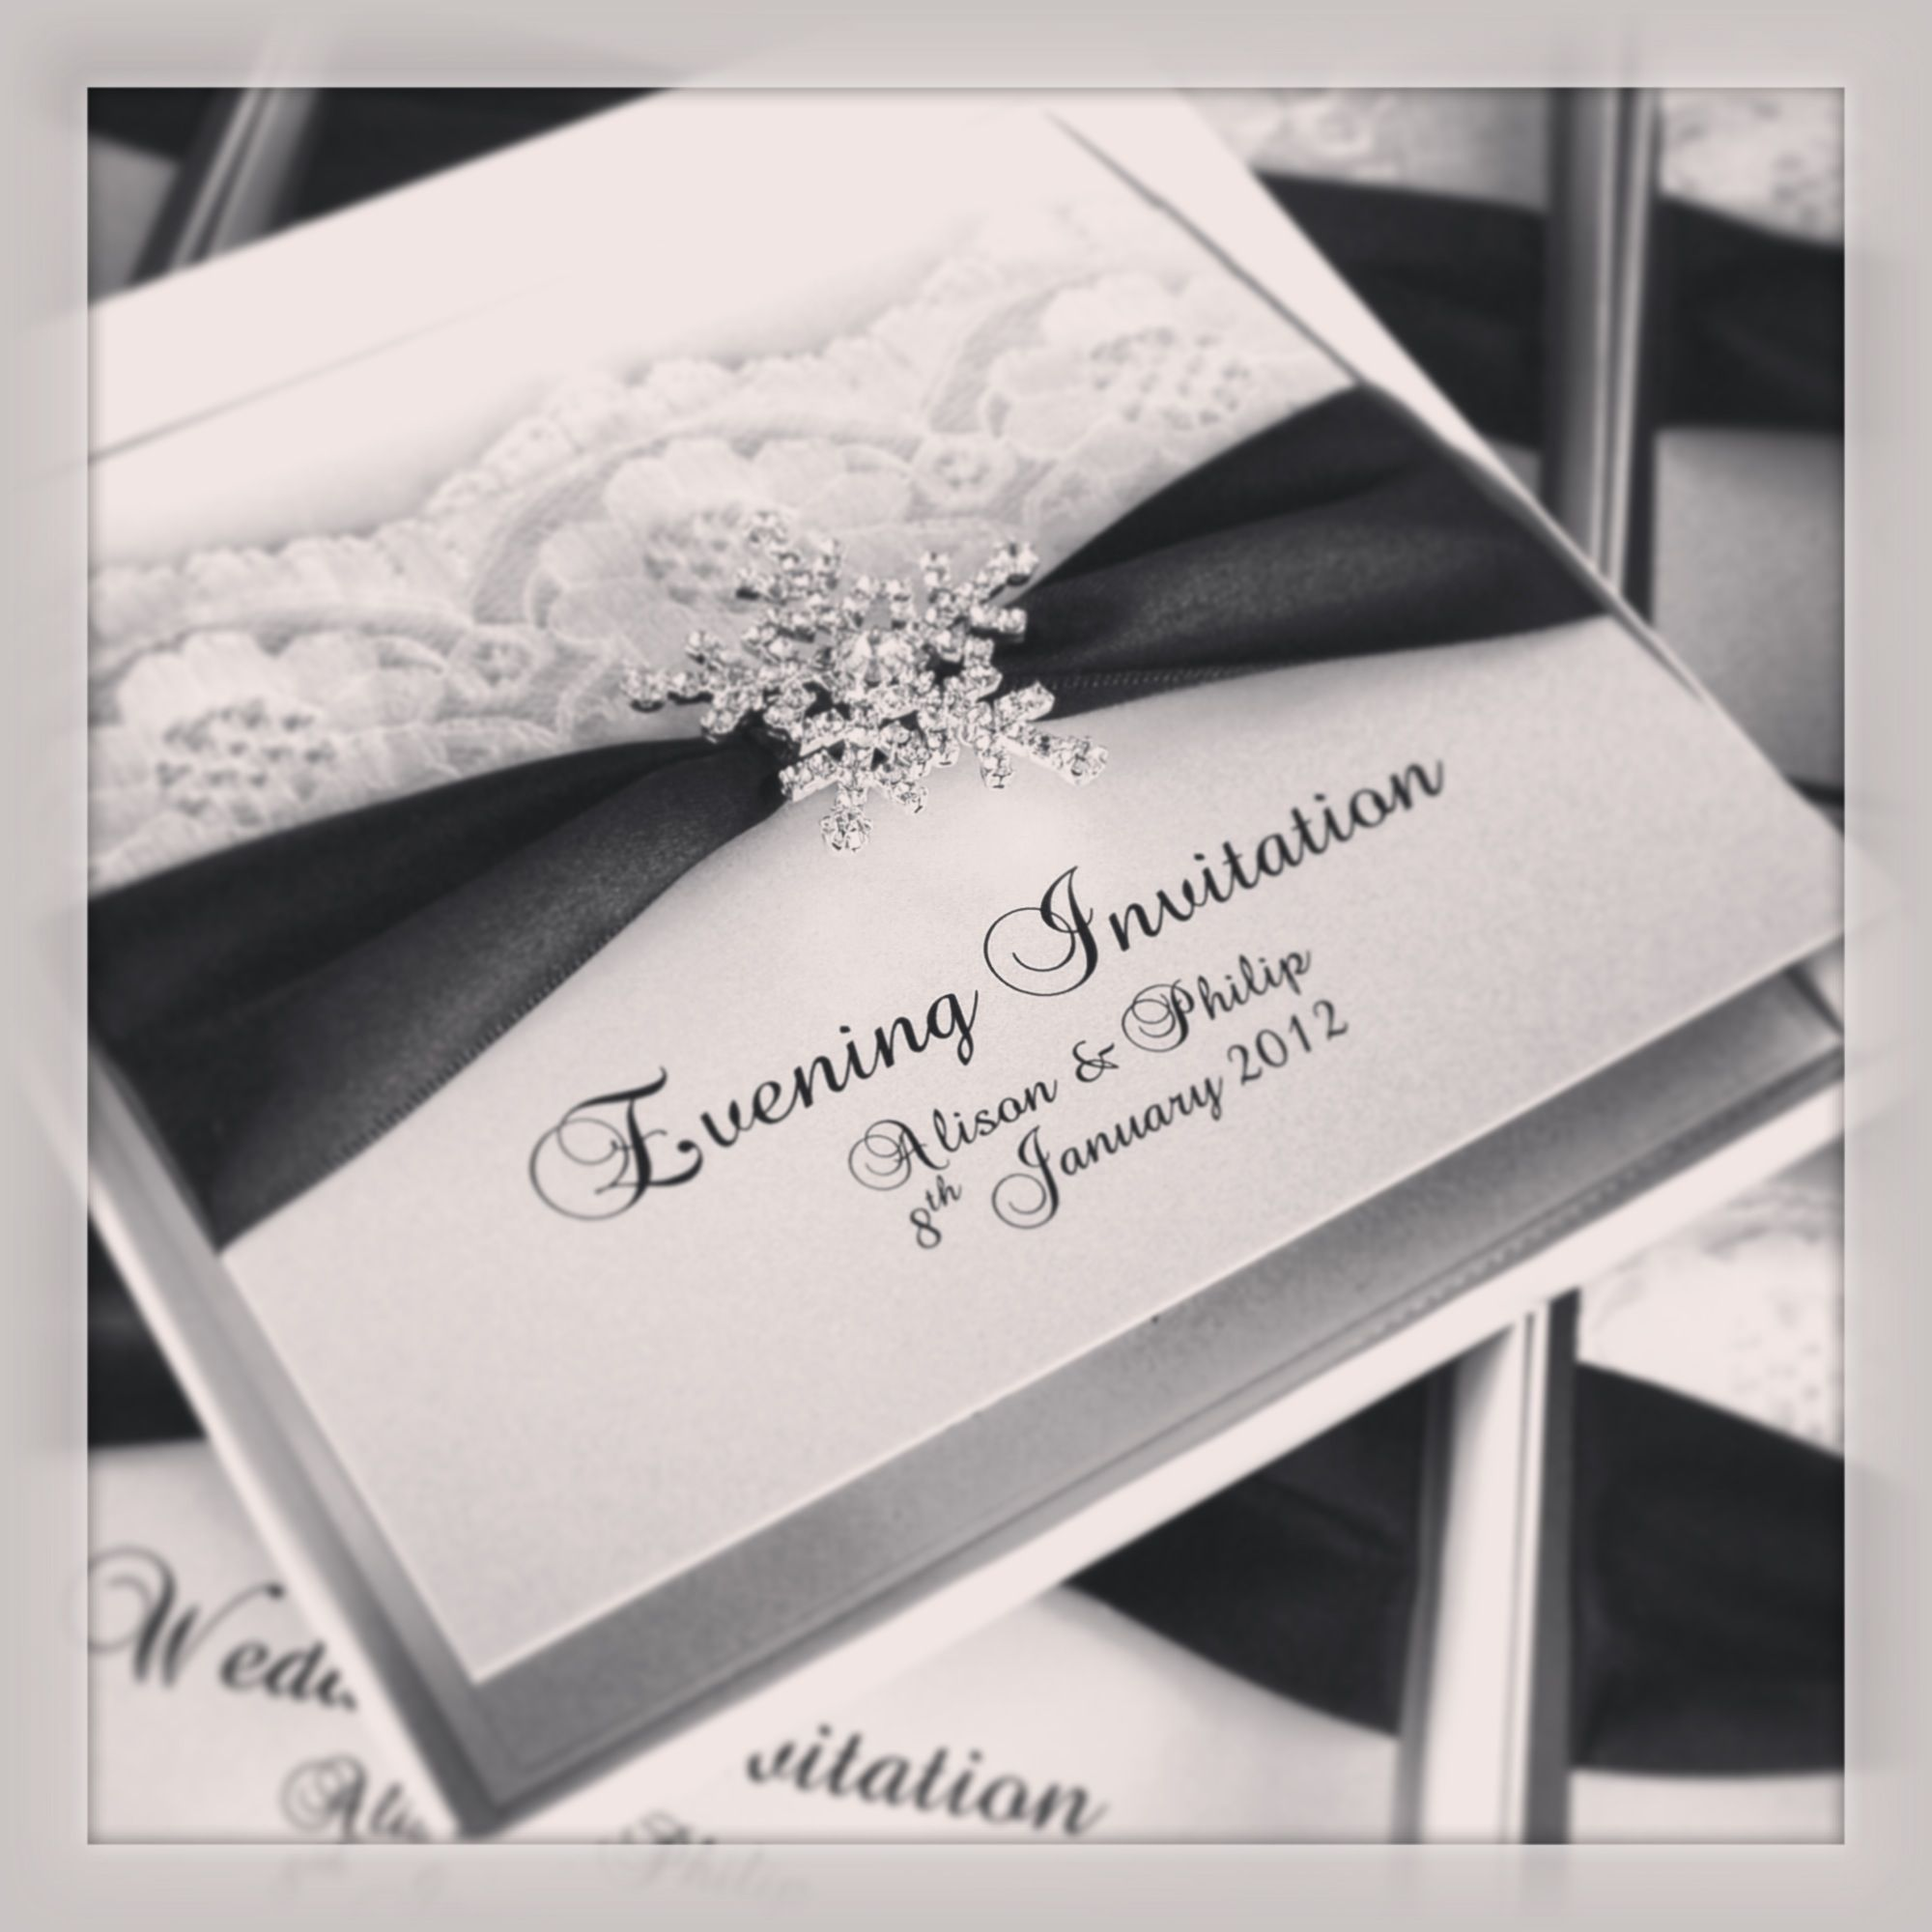 Snowflake wedding invitations | Winter Wonderland Wedding Ideas ...